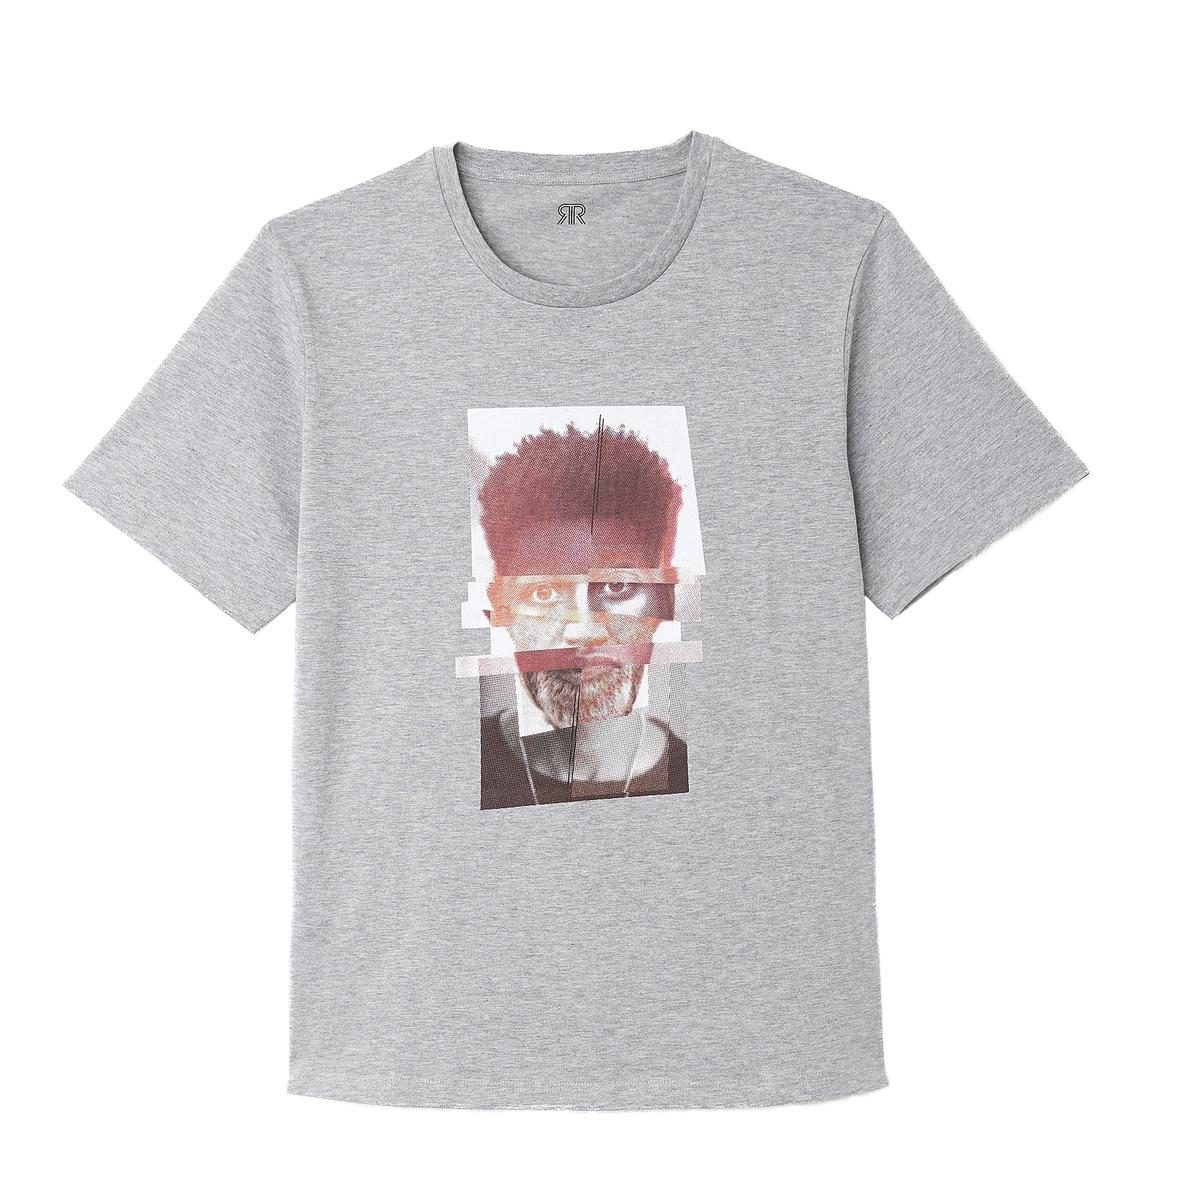 T-shirt de gola redonda, mangas curtas